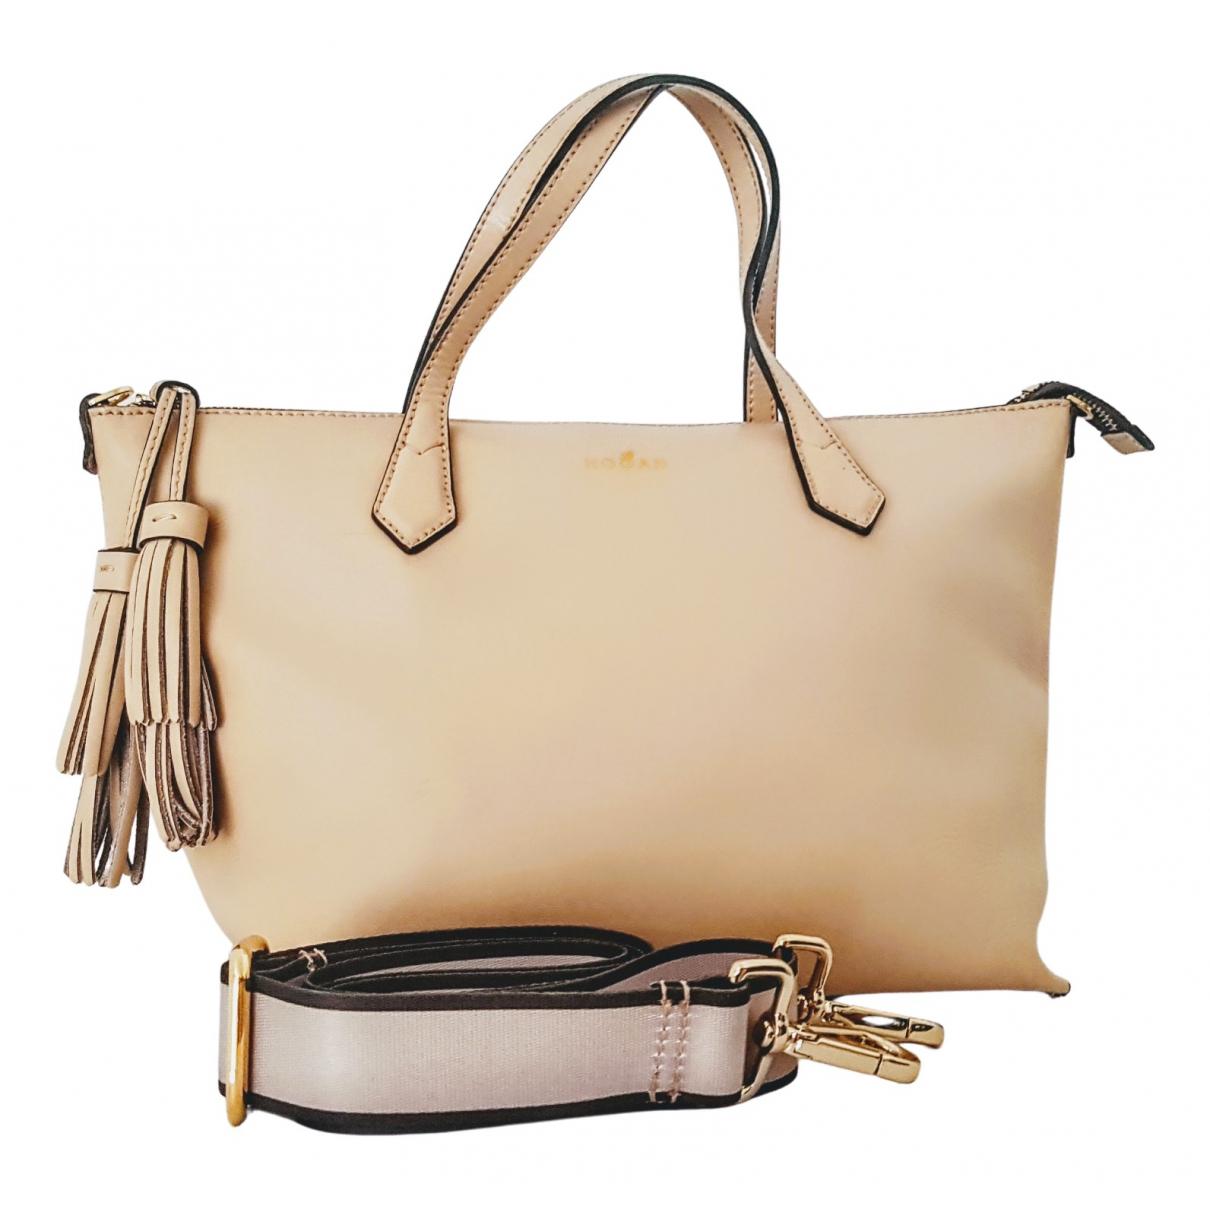 Hogan \N Beige Leather handbag for Women \N